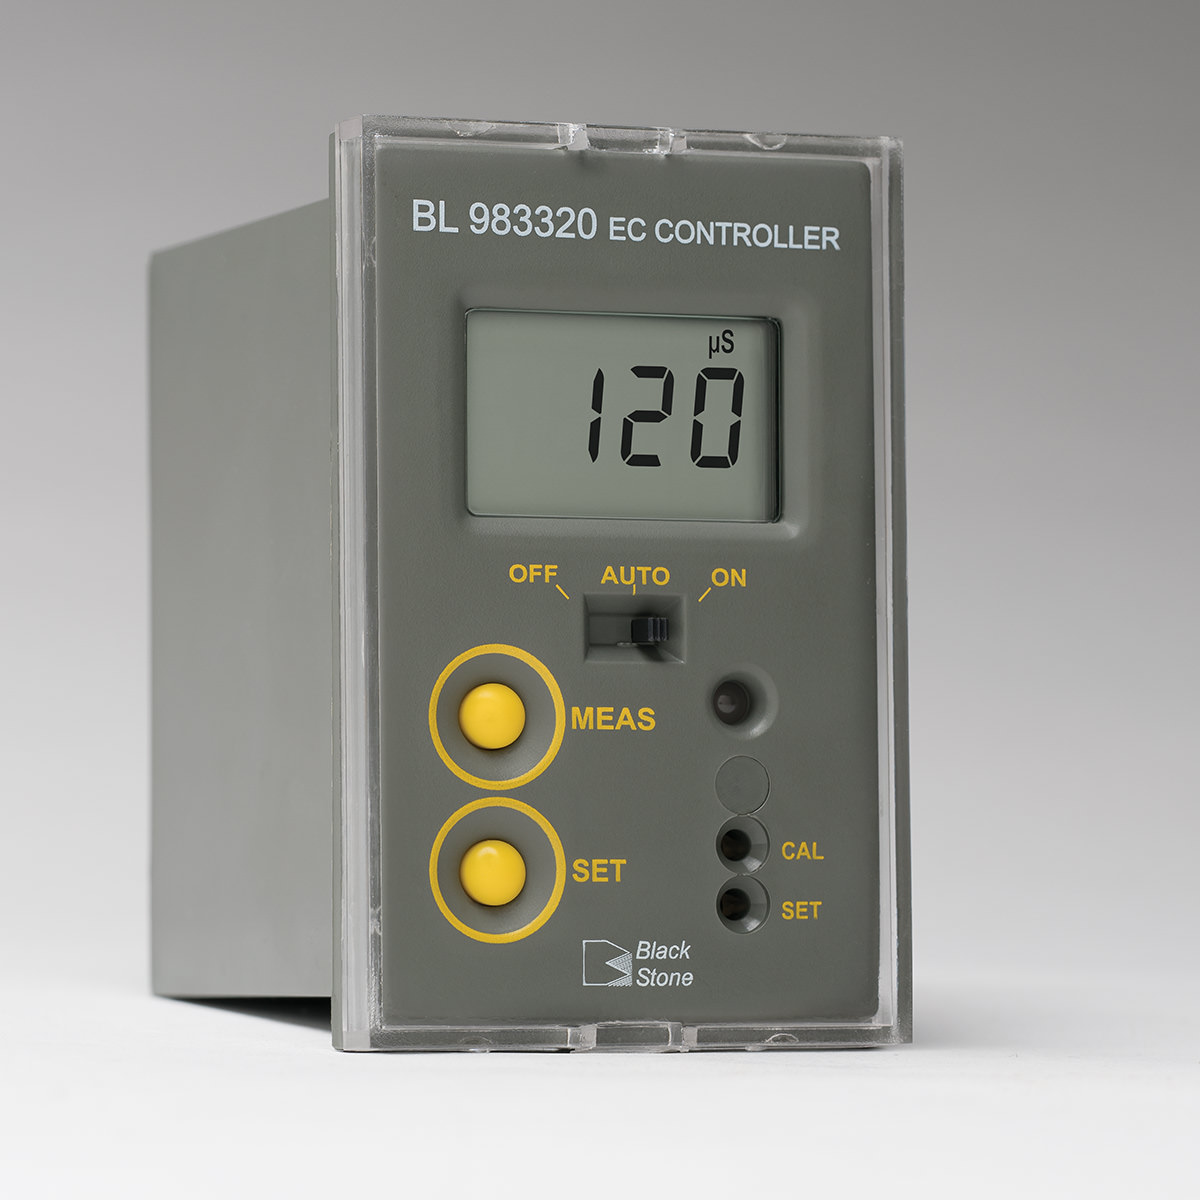 conductivity-ec-controller-bl983320-angle